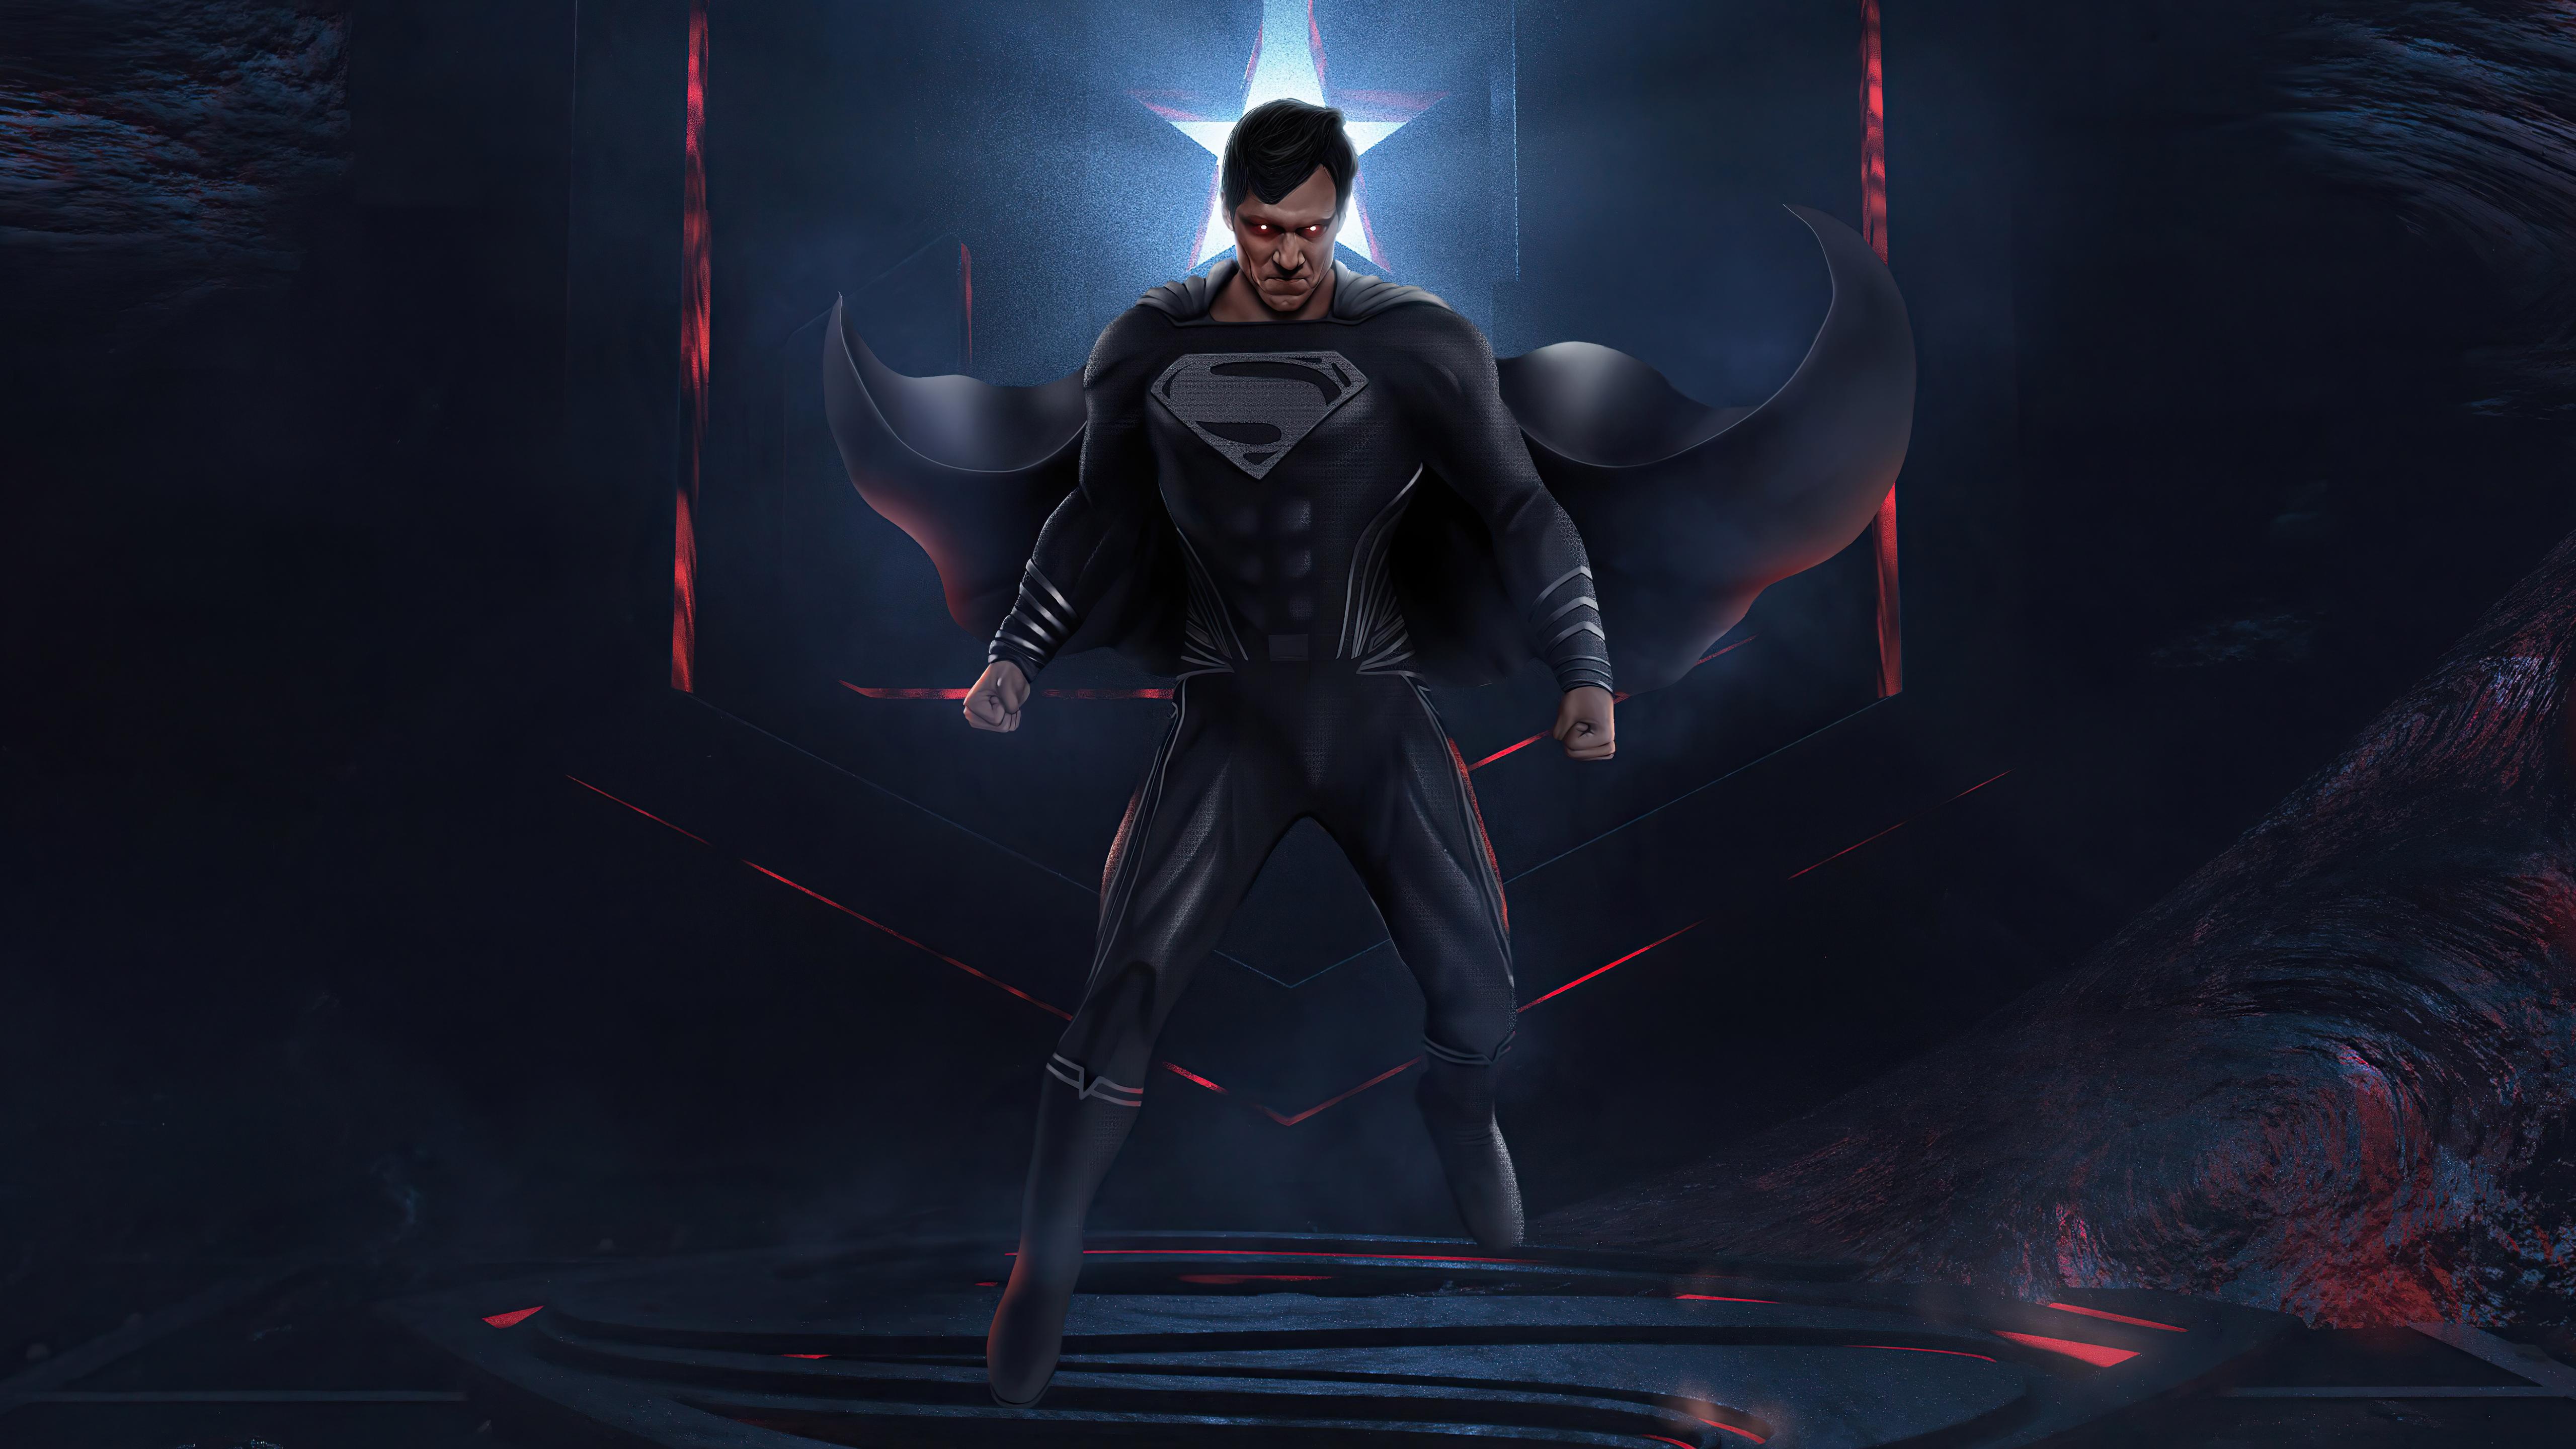 Wallpaper Superman Fanart 2021